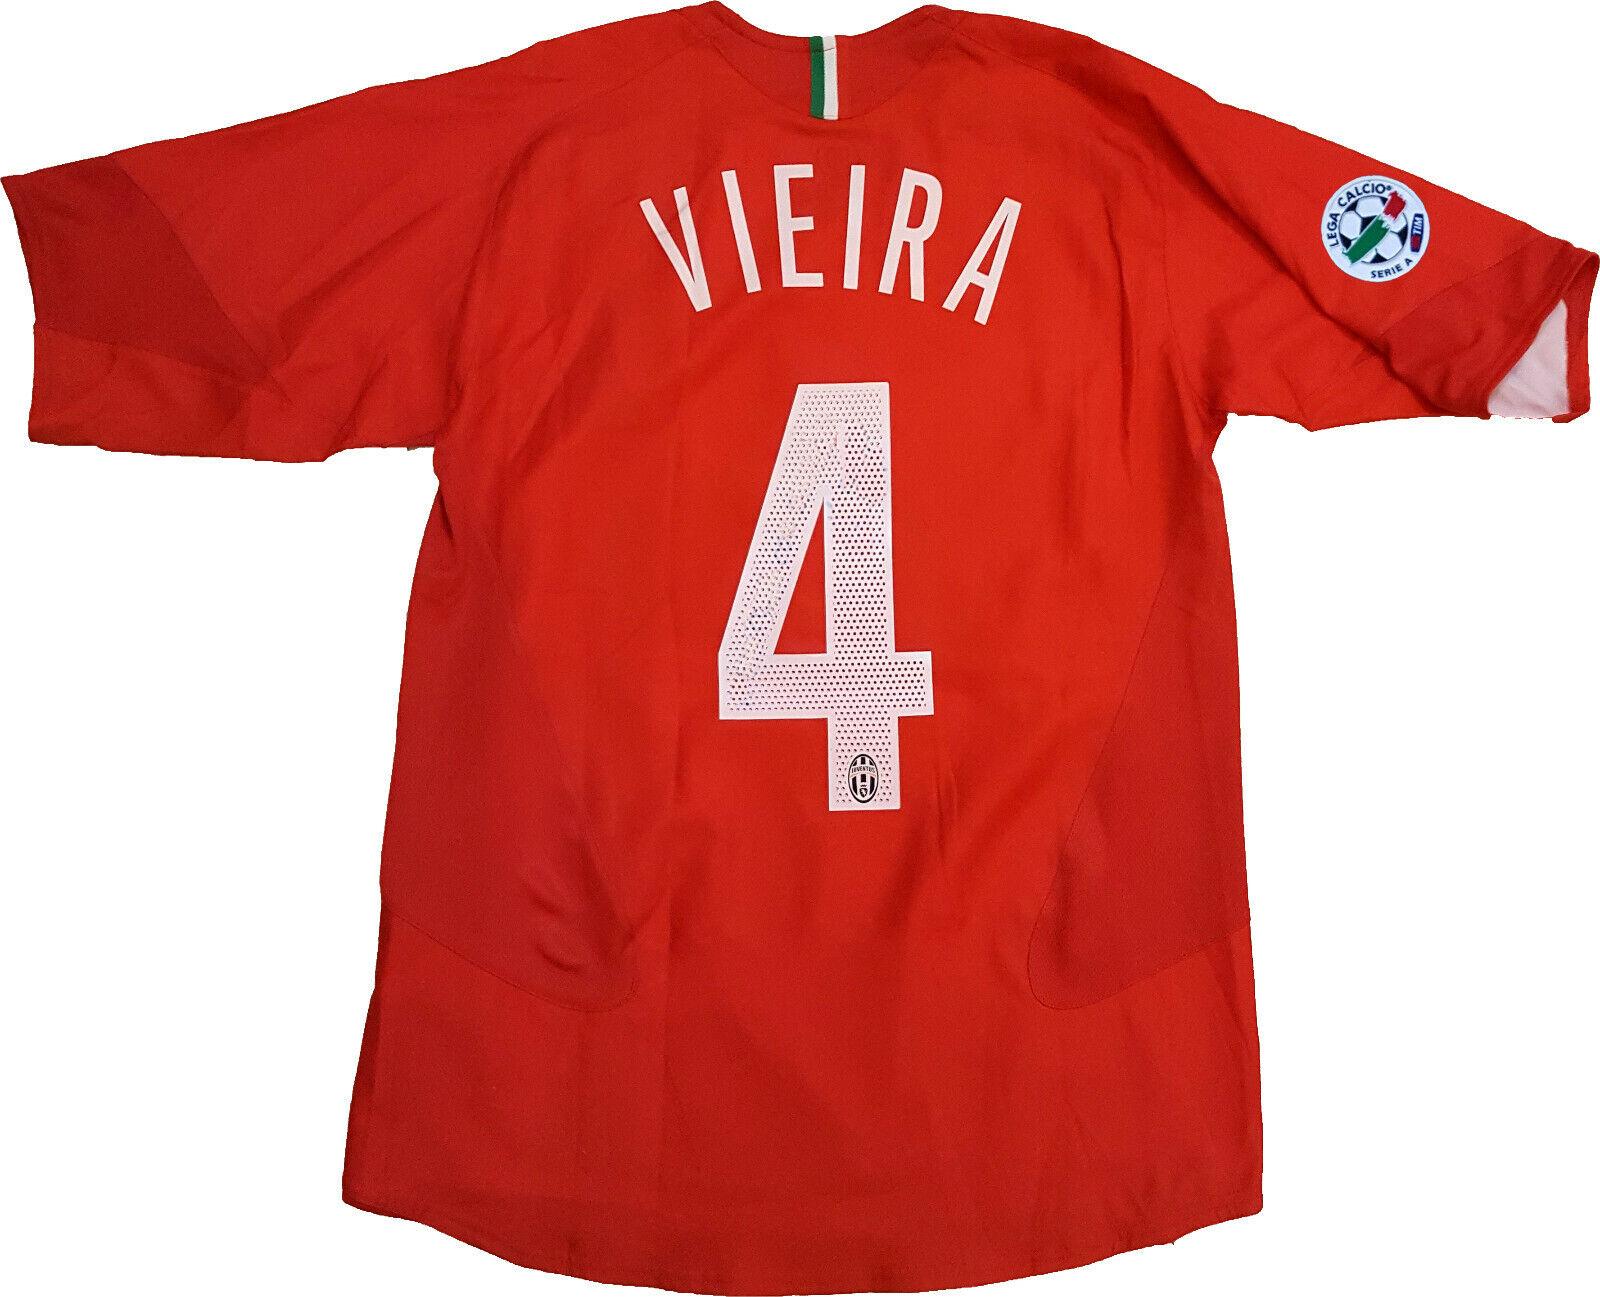 Maglia Vieira Juventus maglia NIKE shirt 2005 2006 ADP 10 home jersey TAMOIL XL